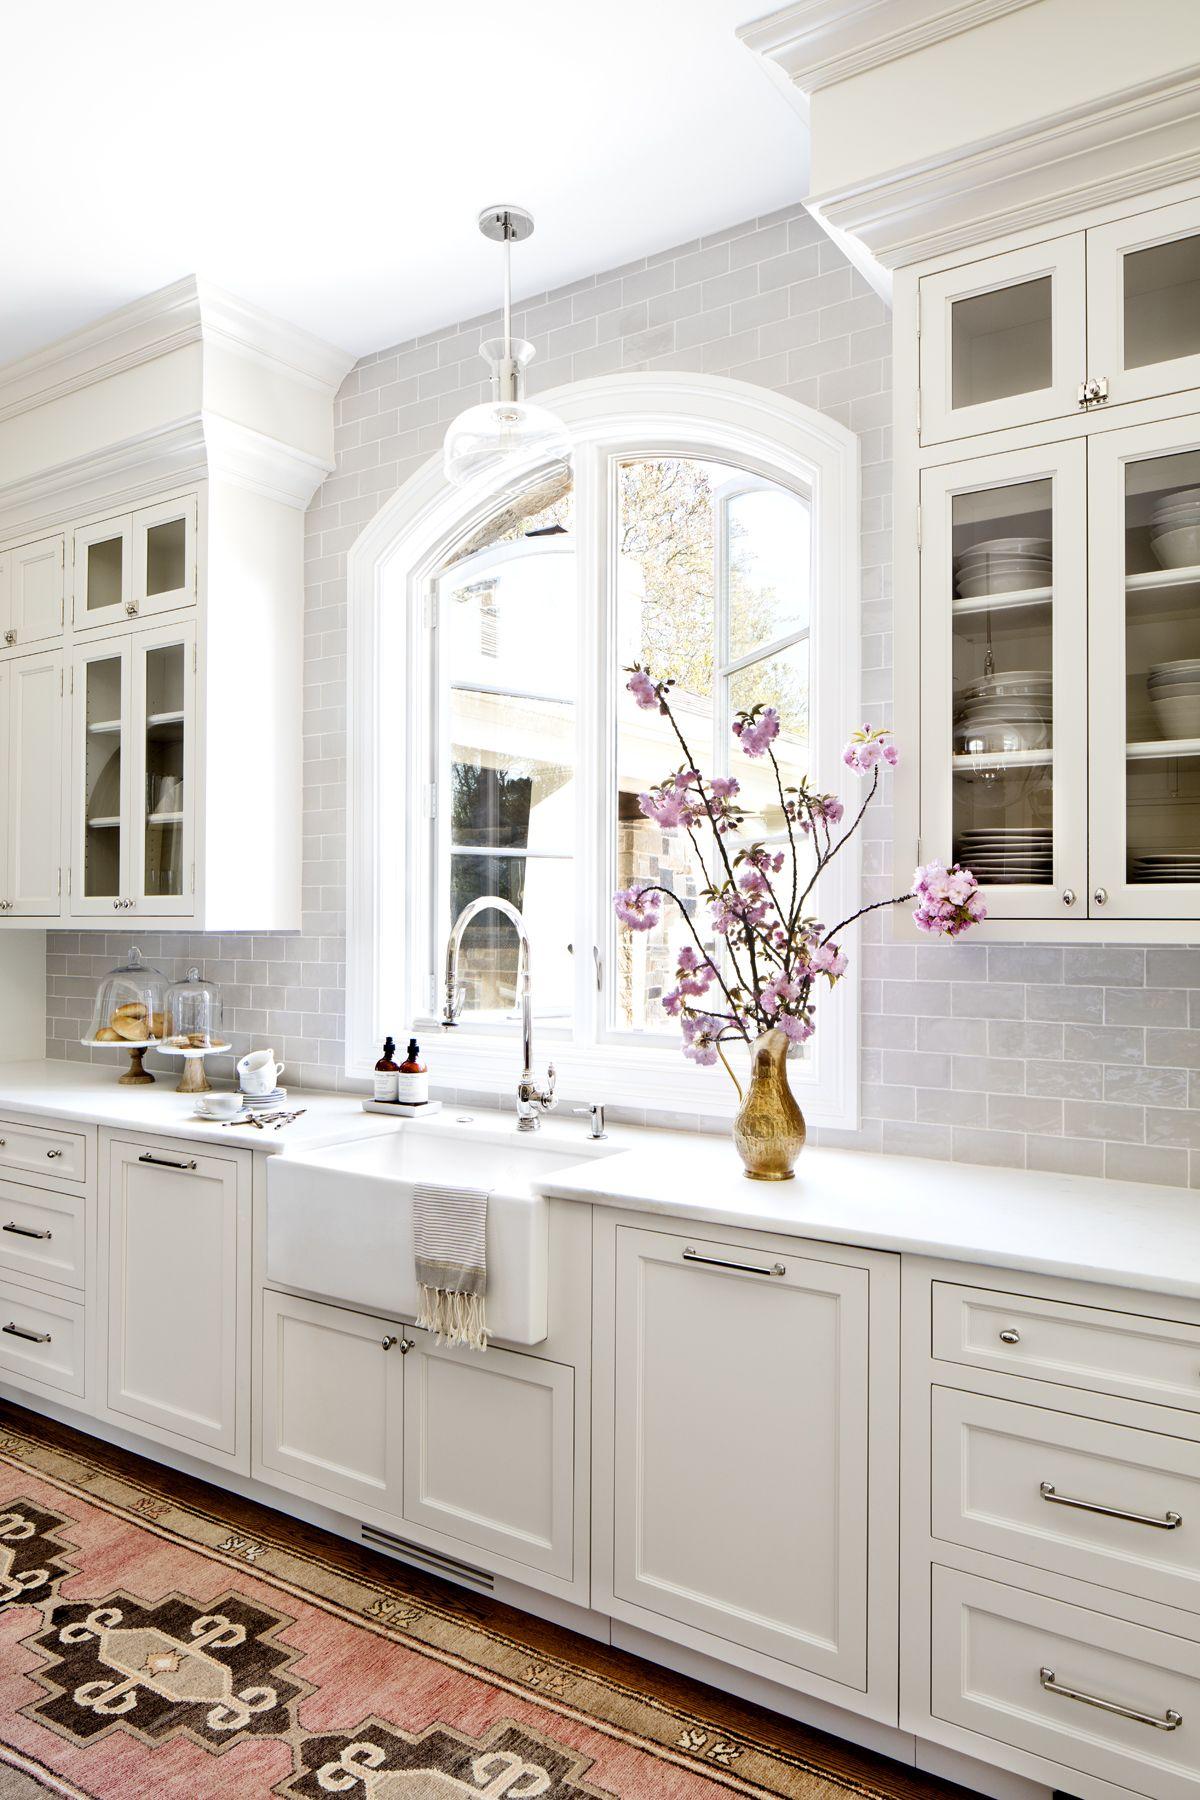 Stephanie gamble interiors custom kitchen with polished nickel